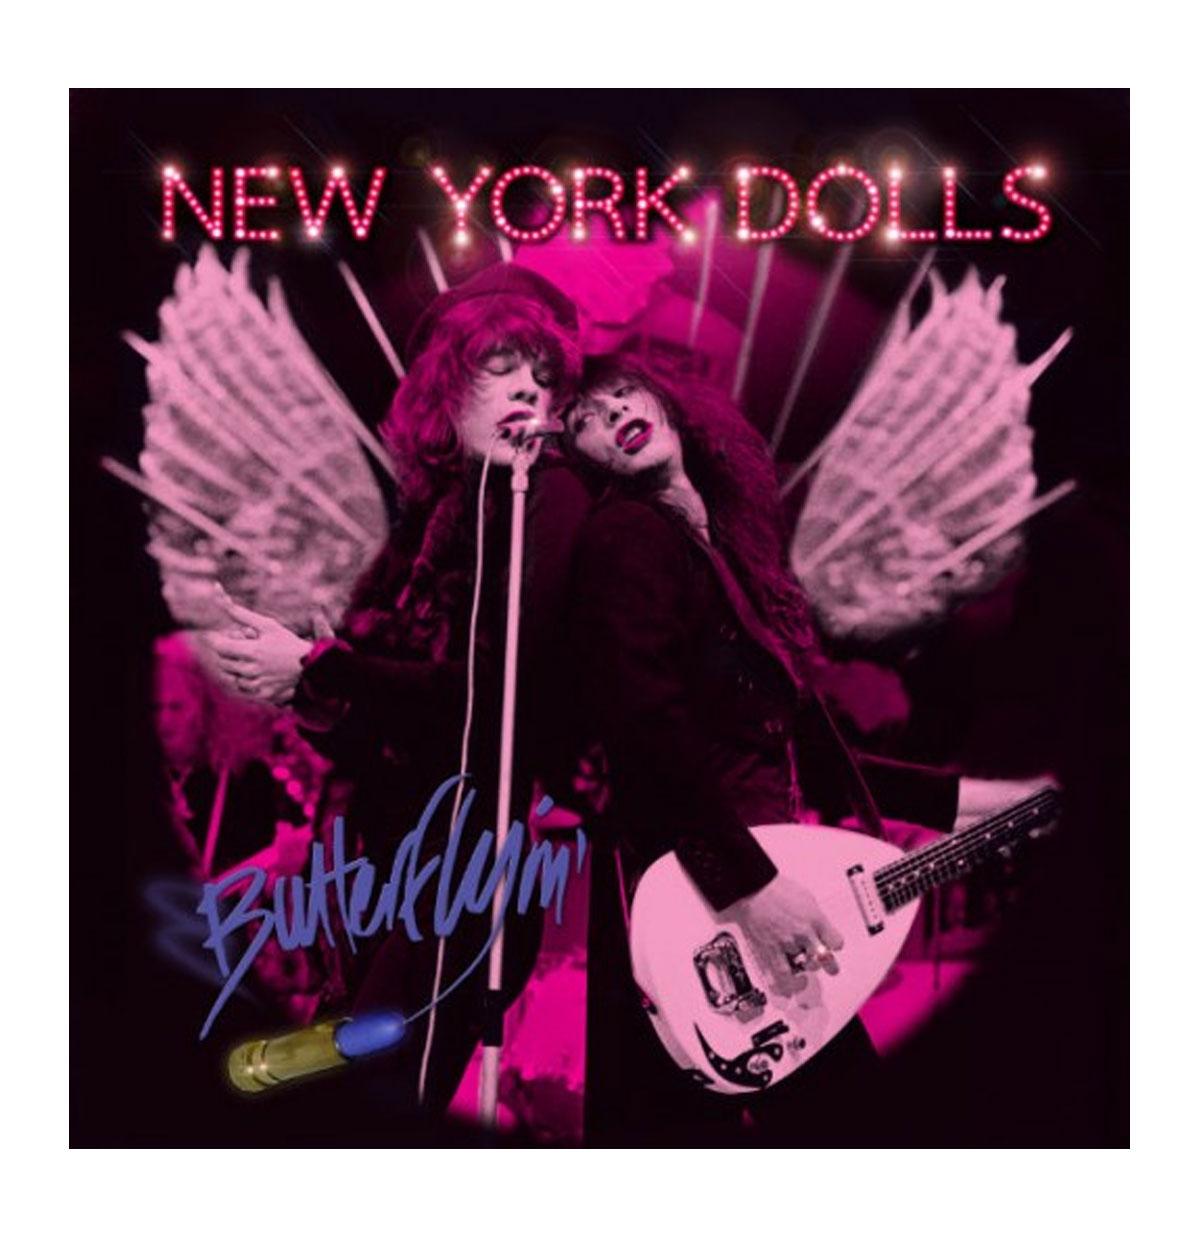 New York Dolls - Butterflyin' LP - LIMITED Pink Vinyl